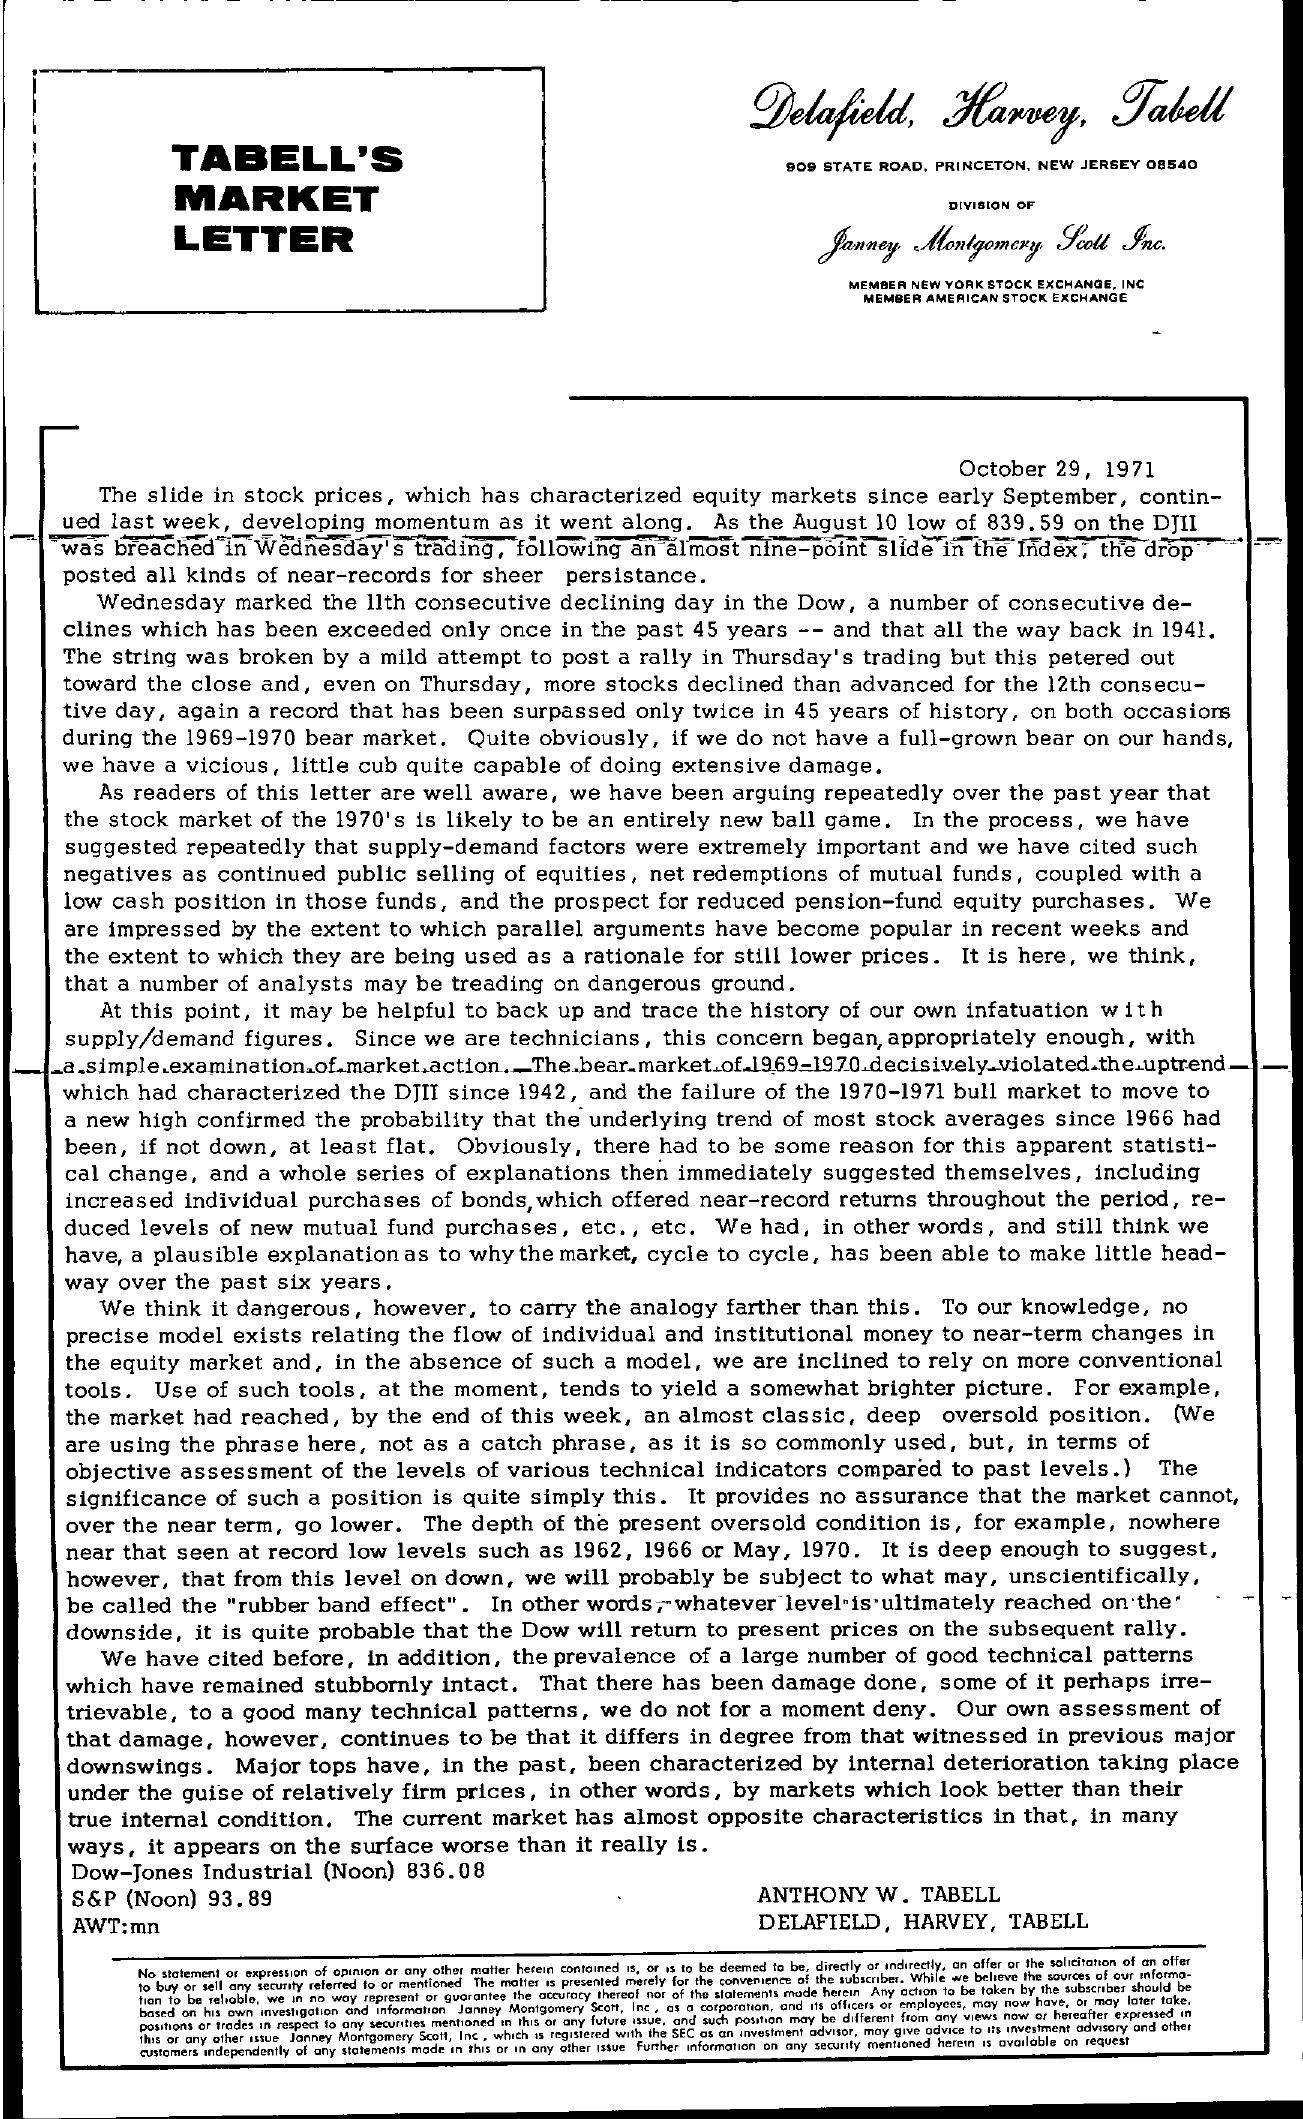 Tabell's Market Letter - October 29, 1971